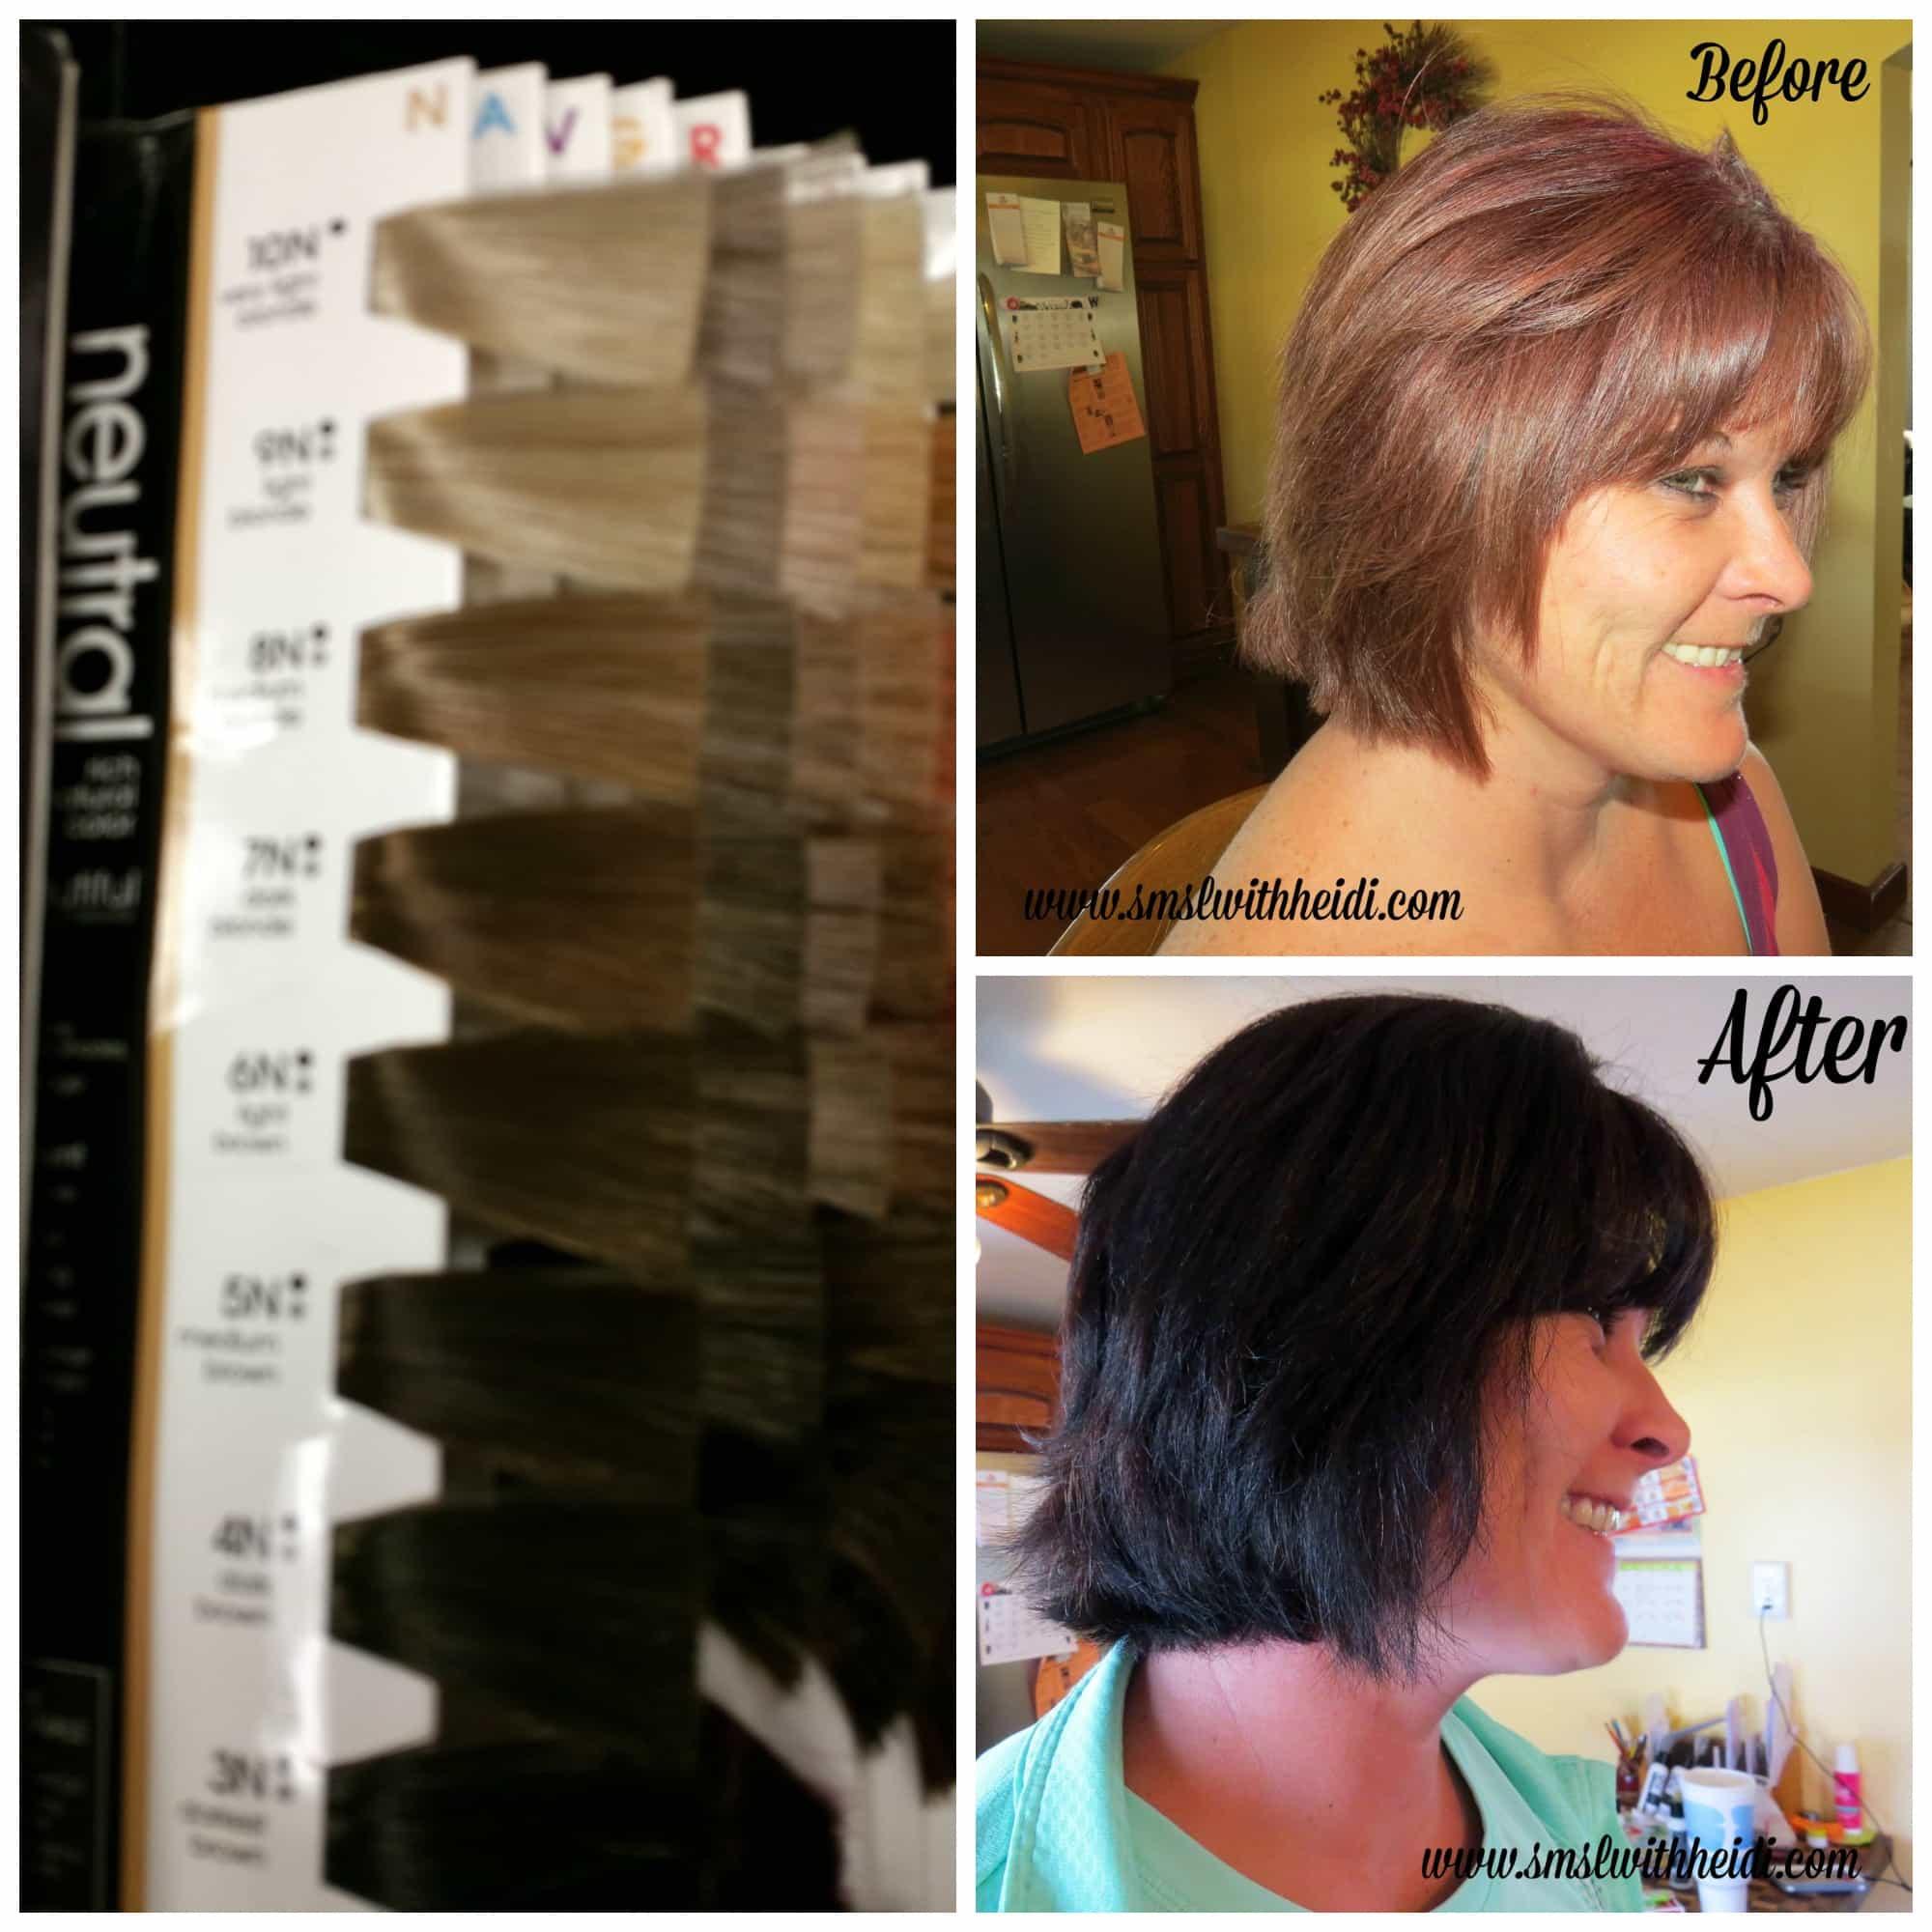 Zotos Agebeautiful Introduces Tint Shine Anti Aging Haircolor News